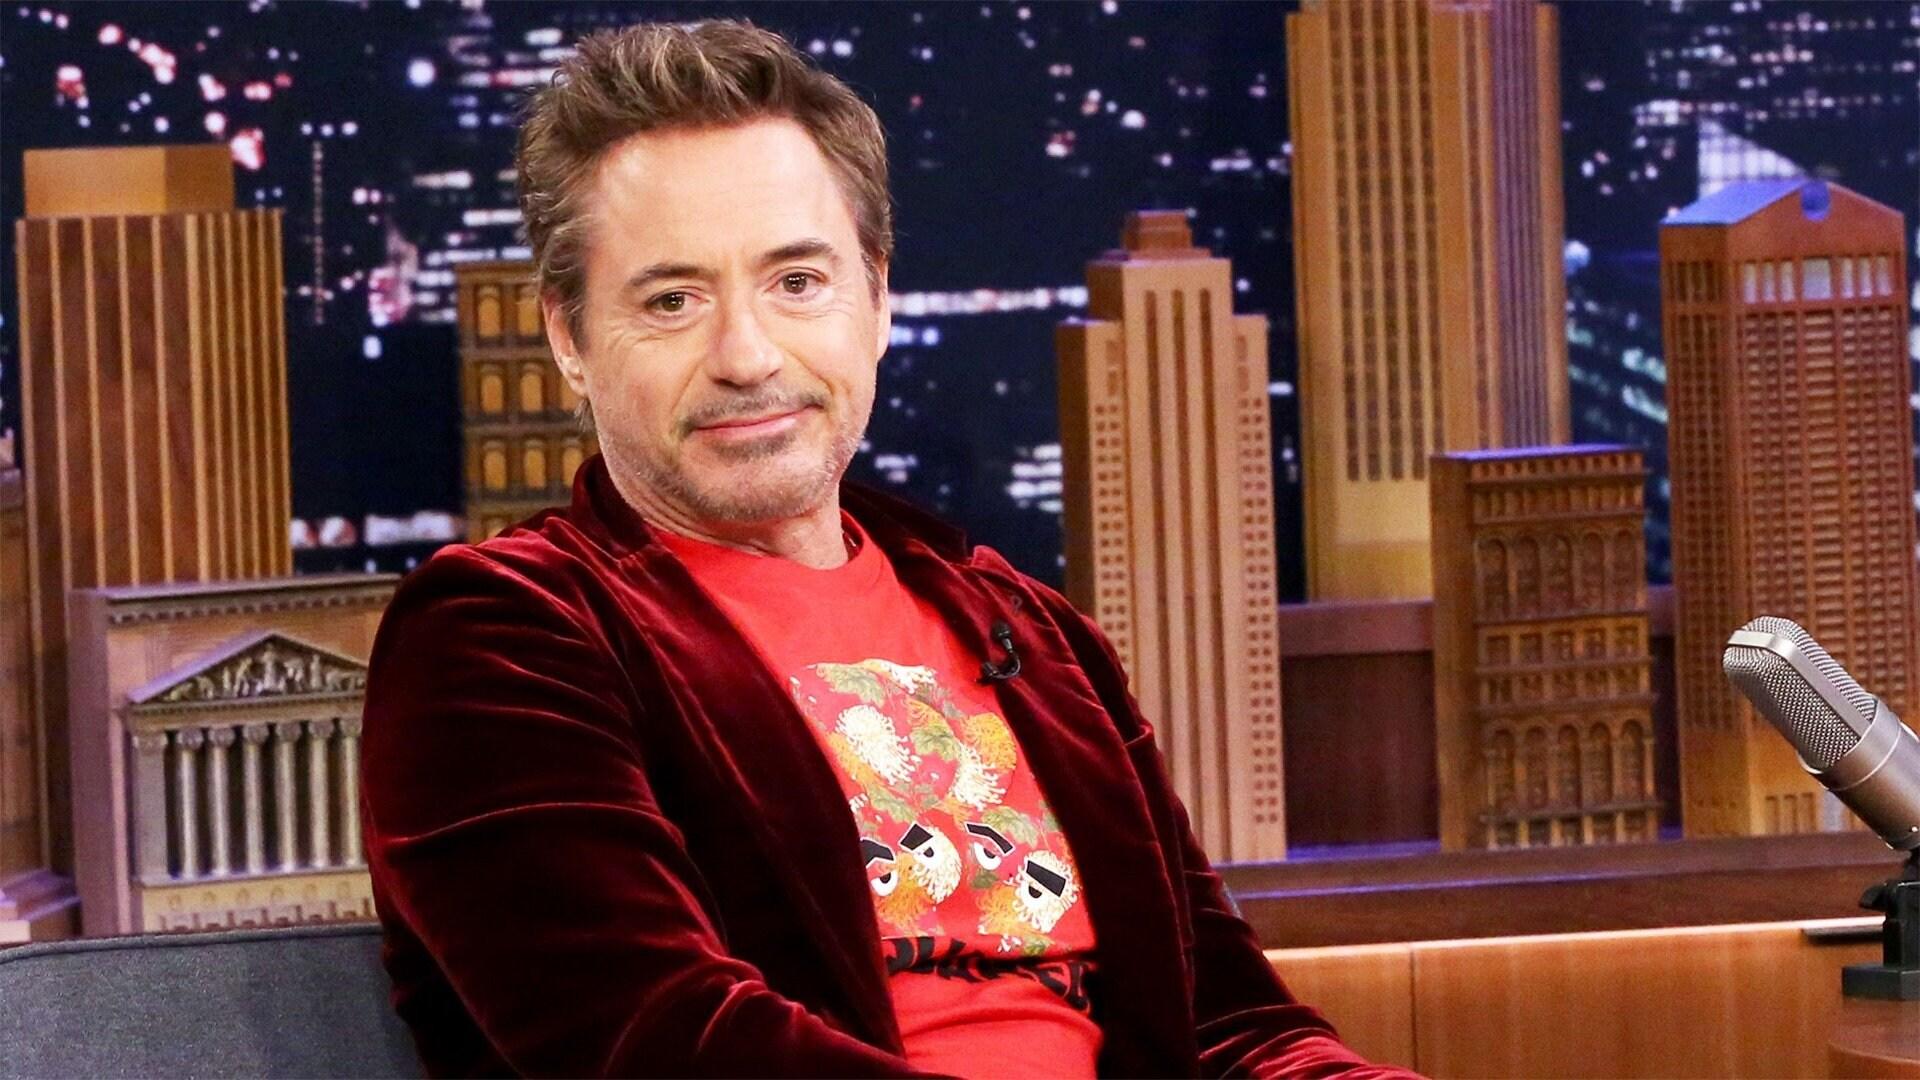 Robert Downey Jr.; Aidy Bryant; Little Big Town